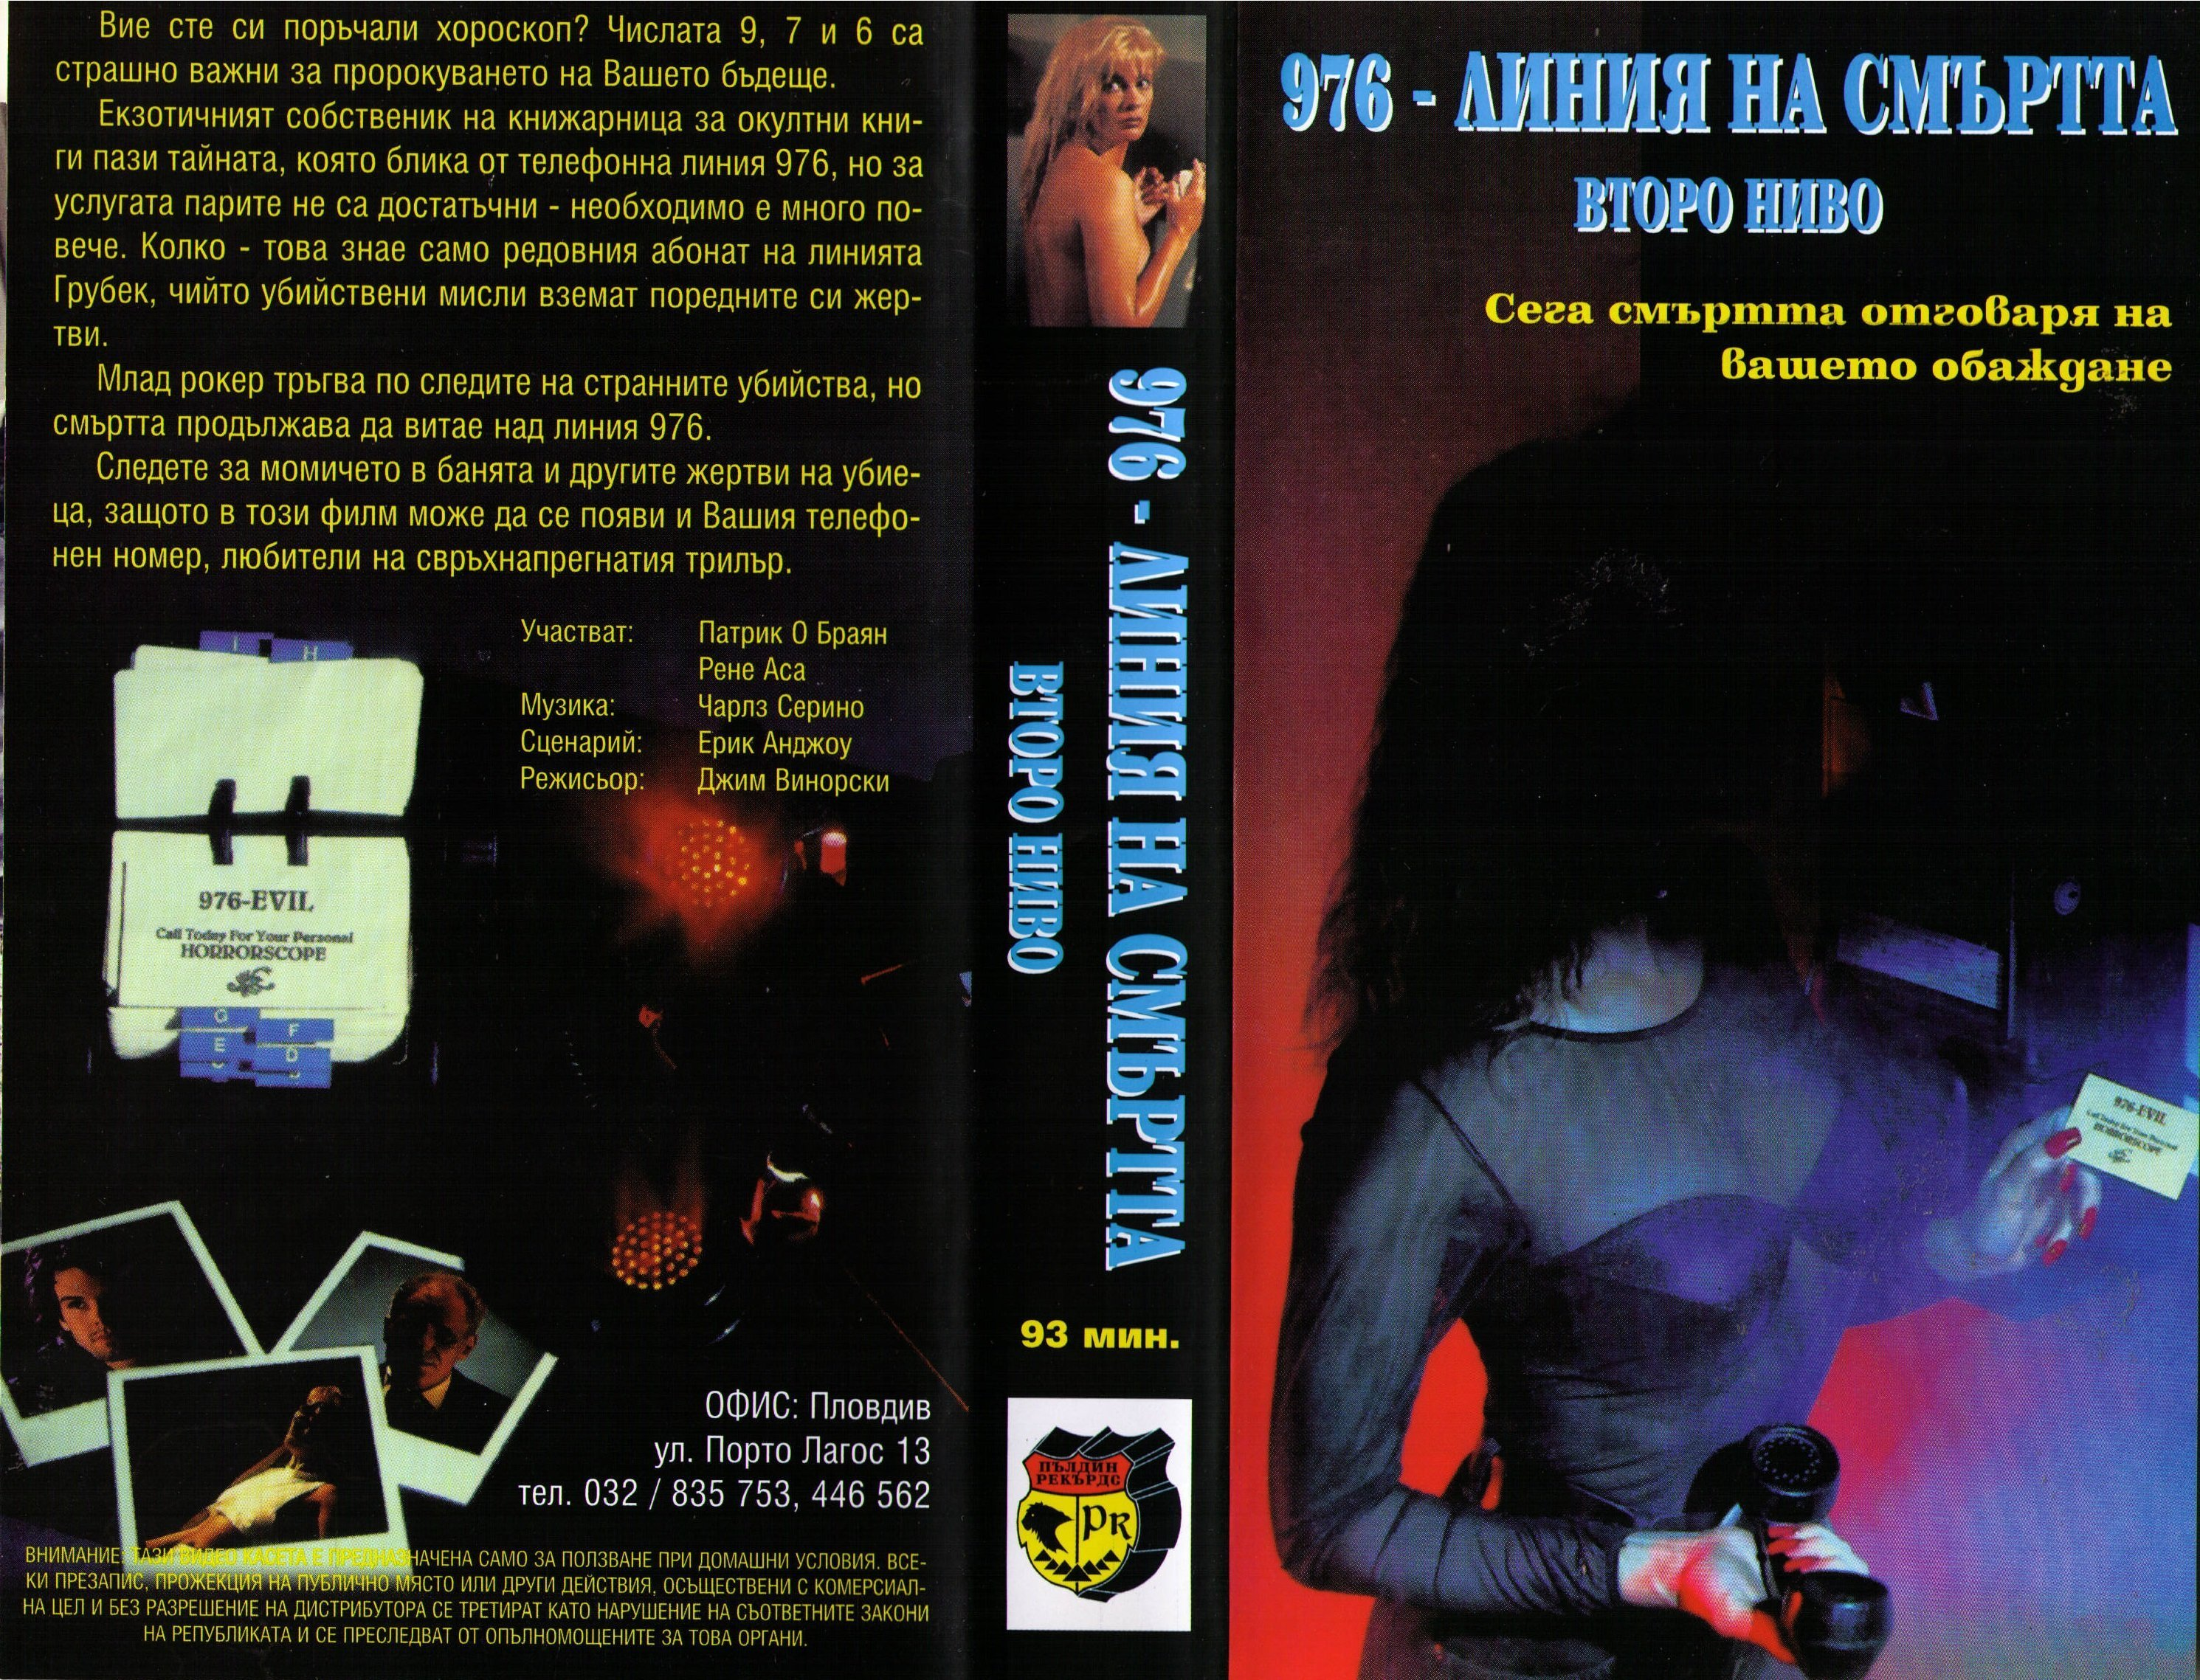 976 - Линия на смъртта второ ниво филм постер